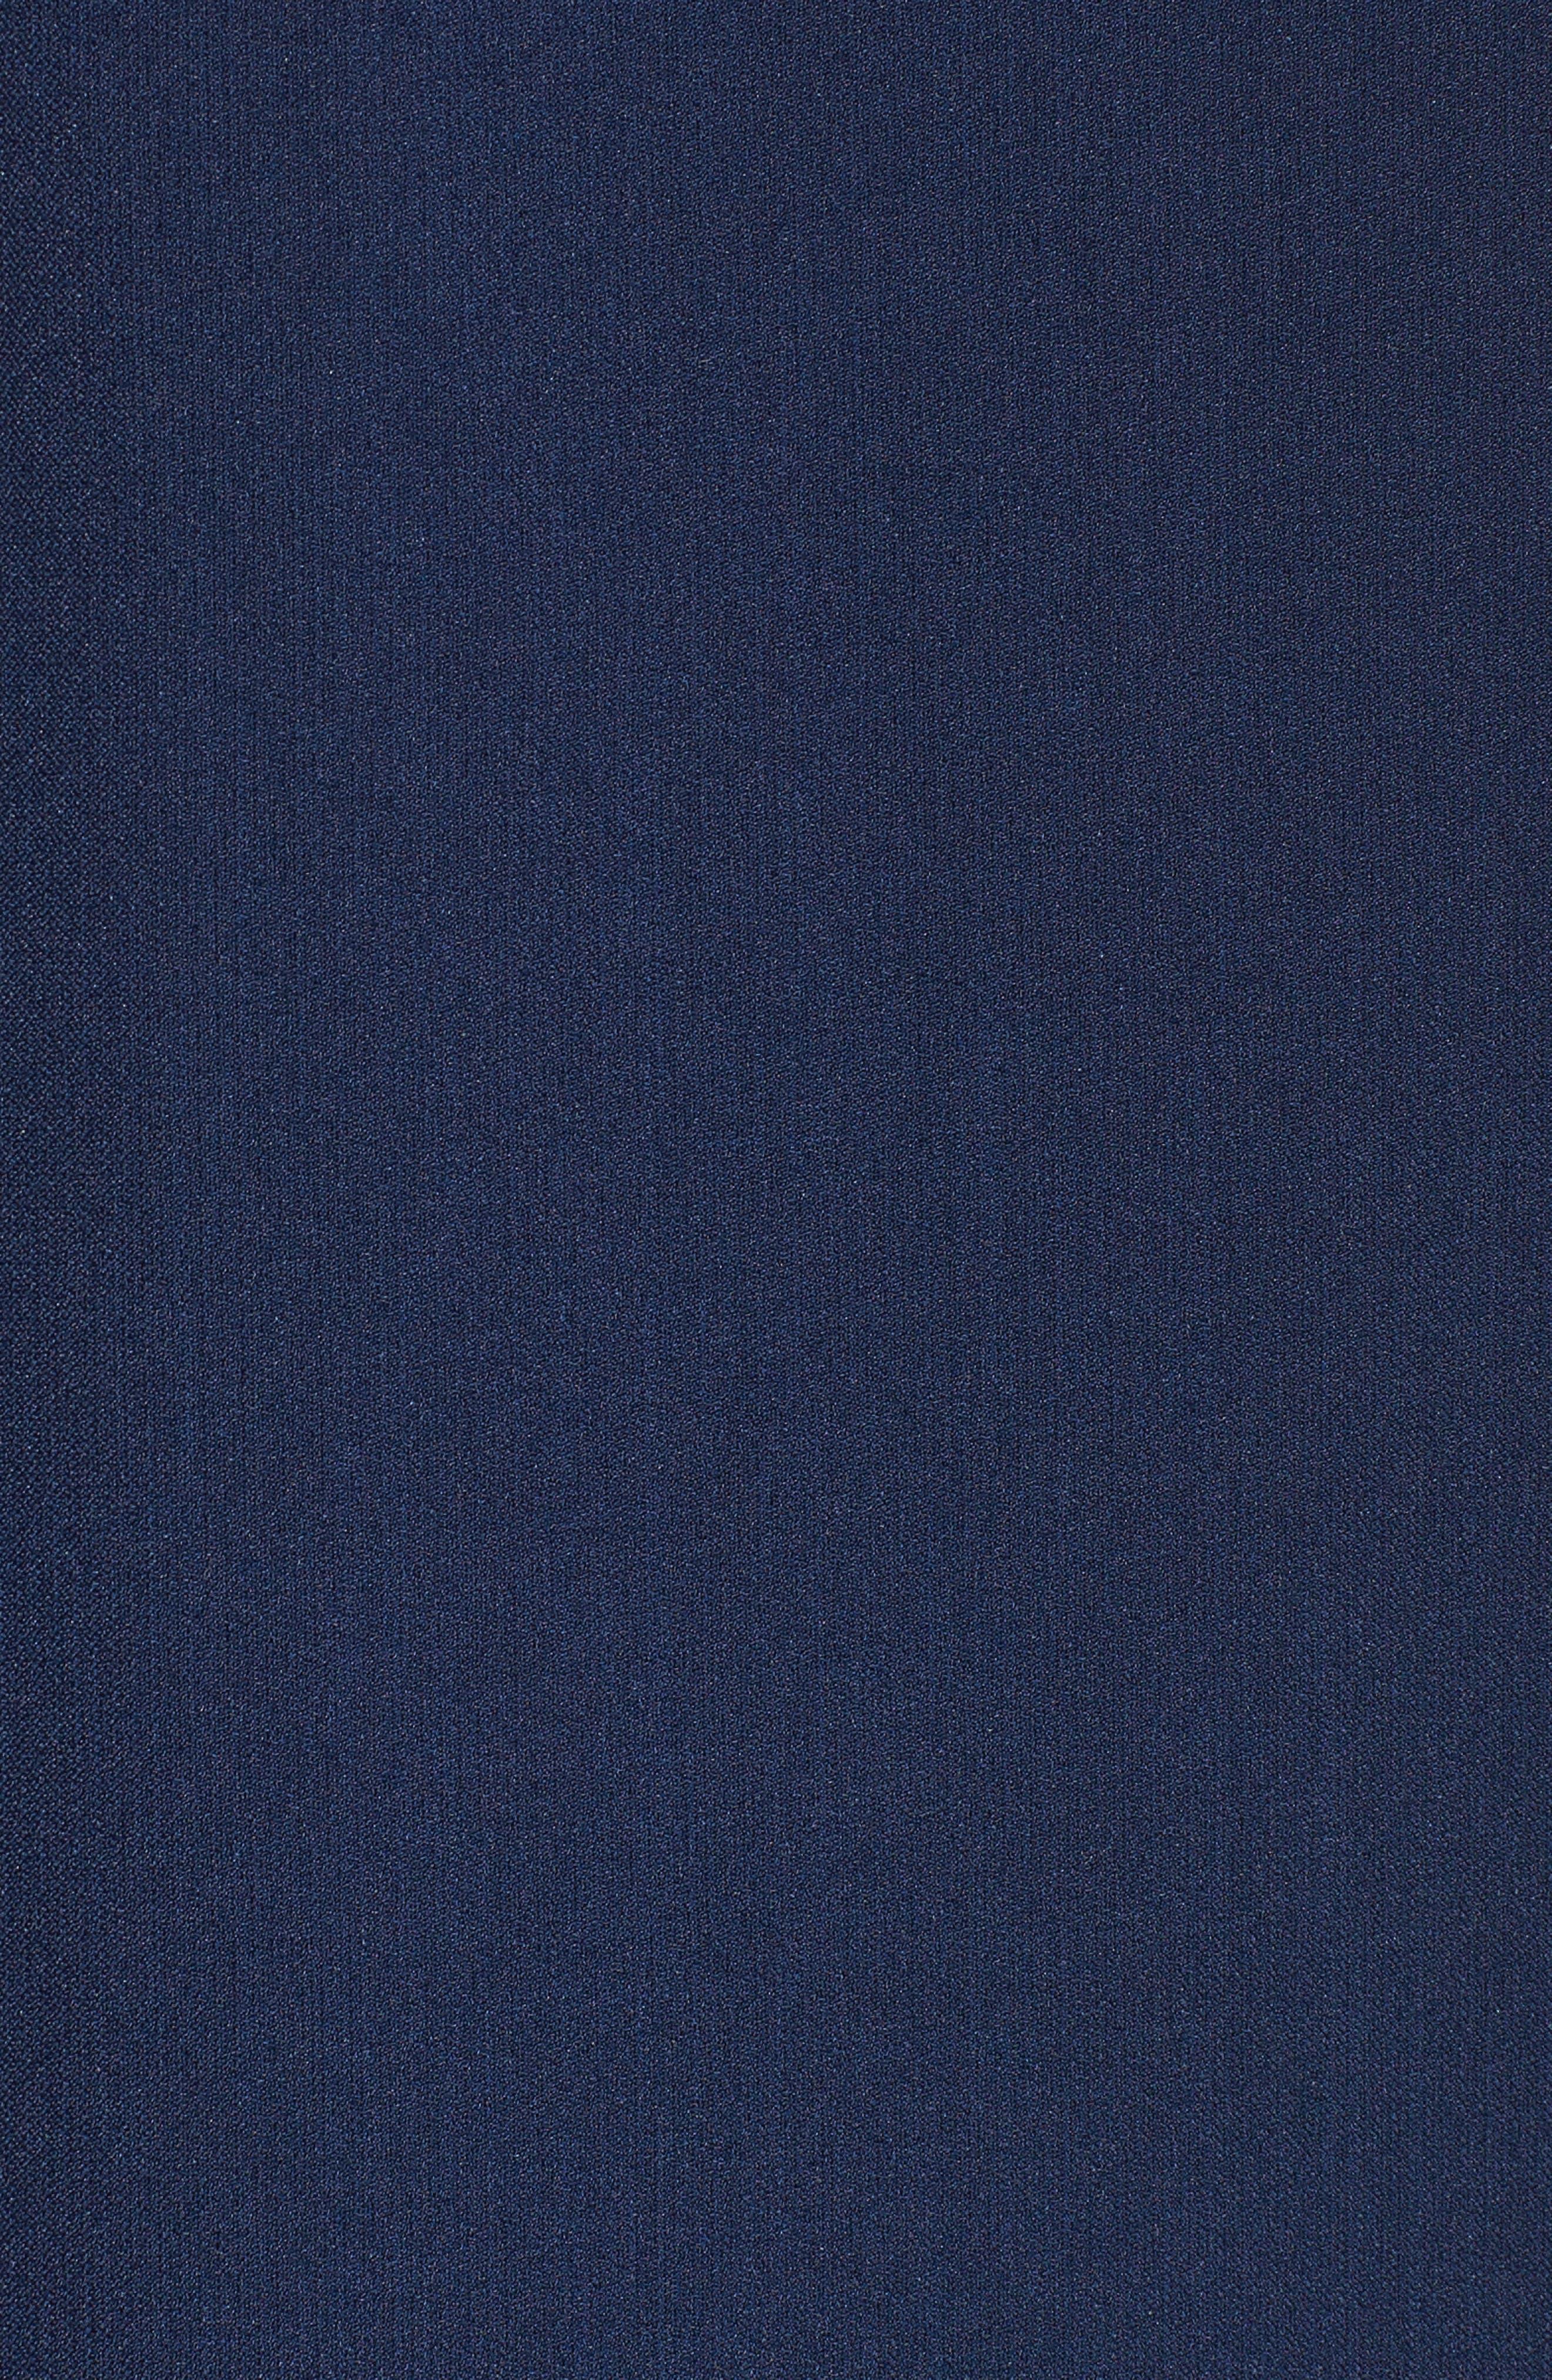 Scallop Inset Crepe Sheath Dress,                             Alternate thumbnail 6, color,                             412